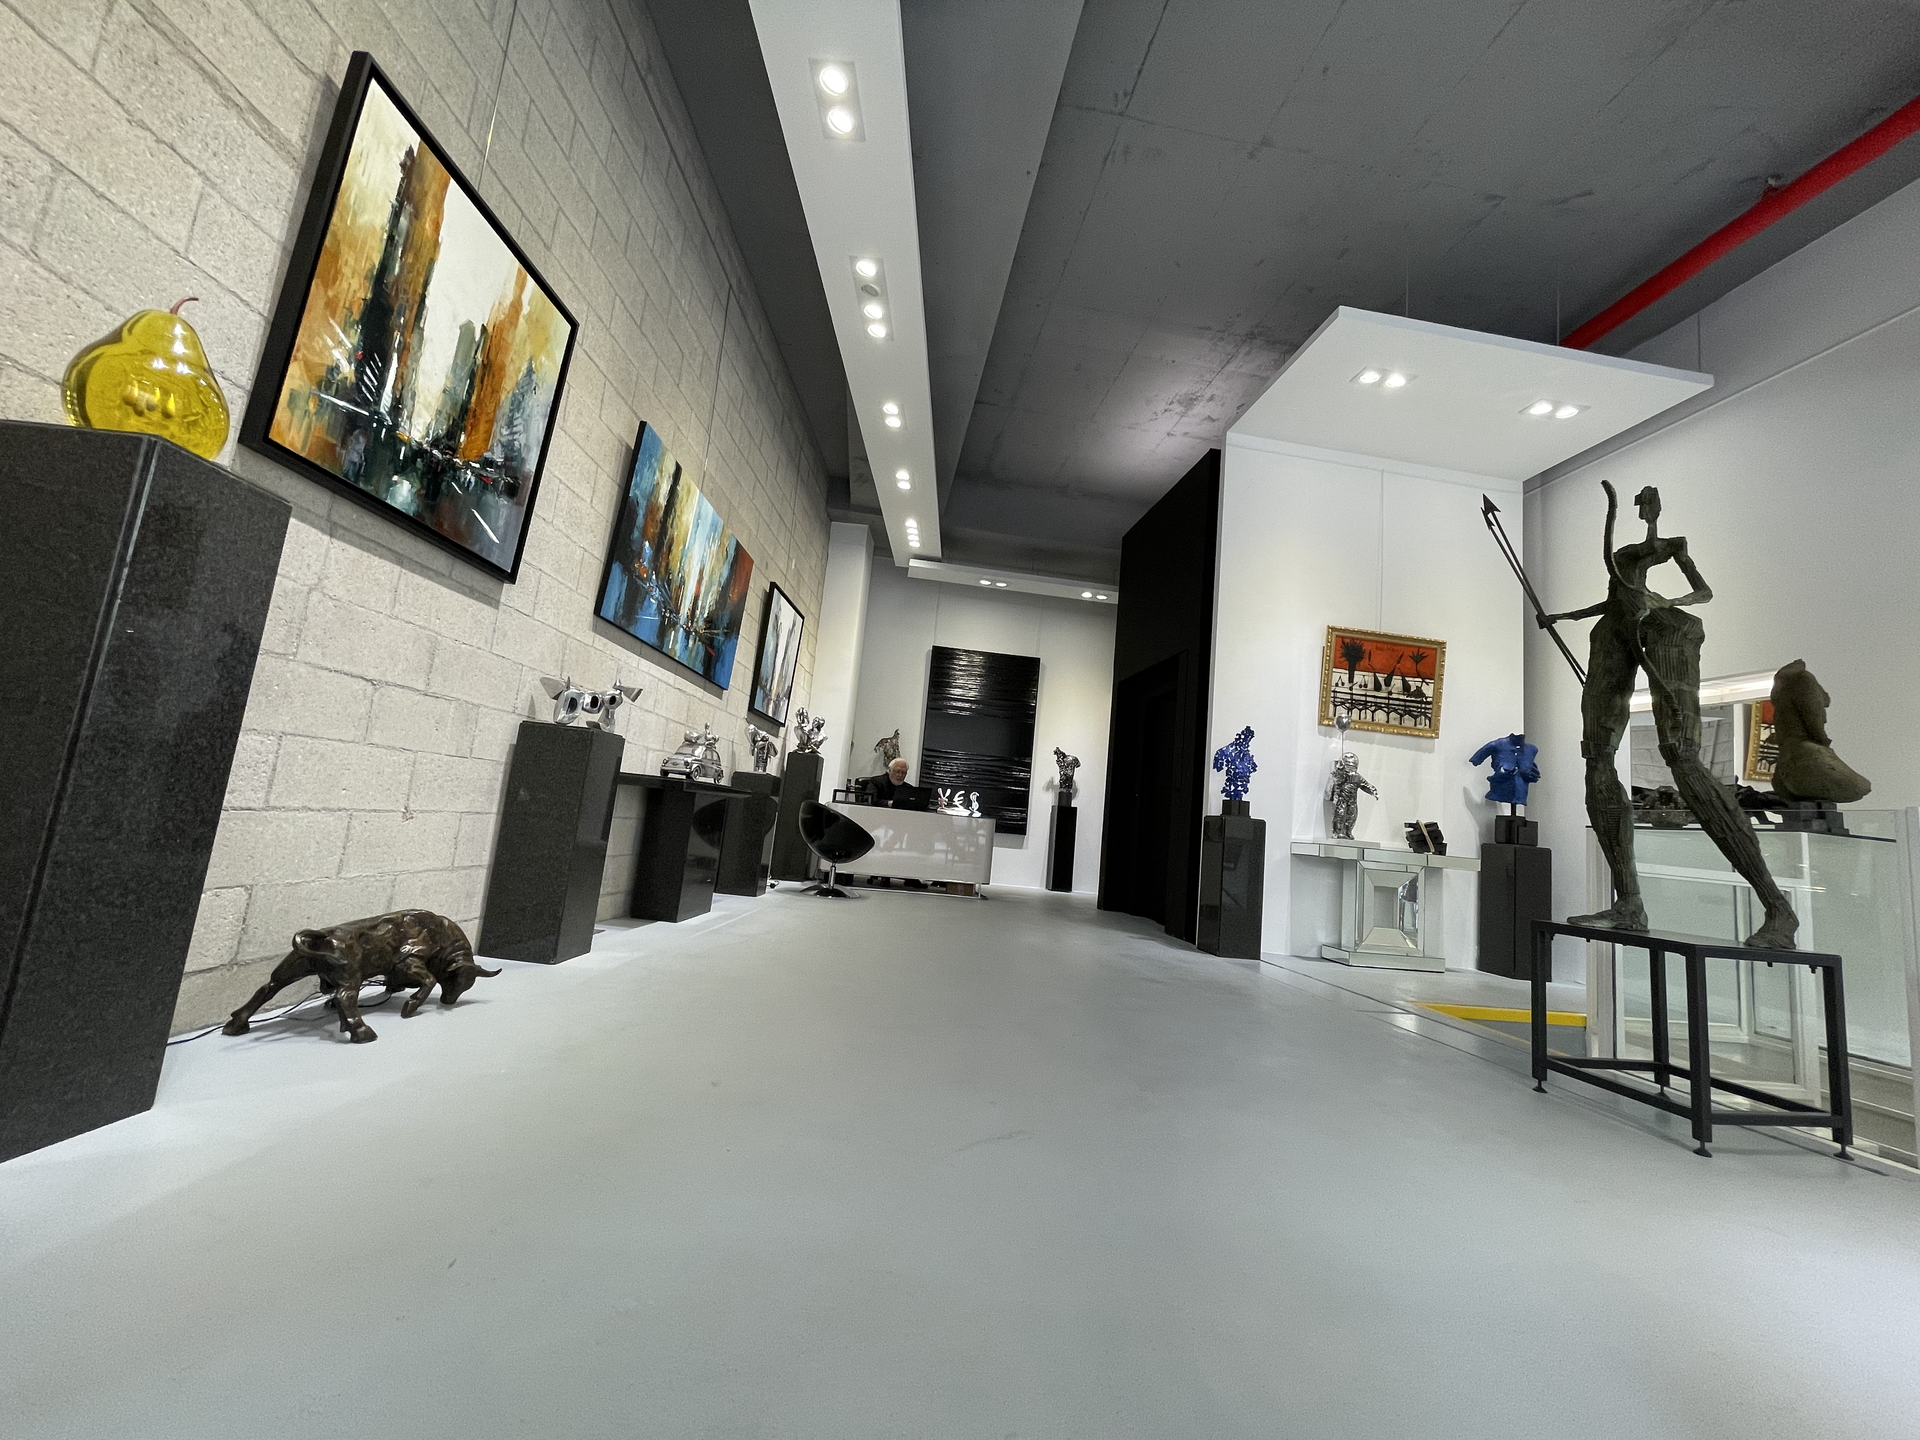 Galerie Leadouze 16 Matignon .HEIC